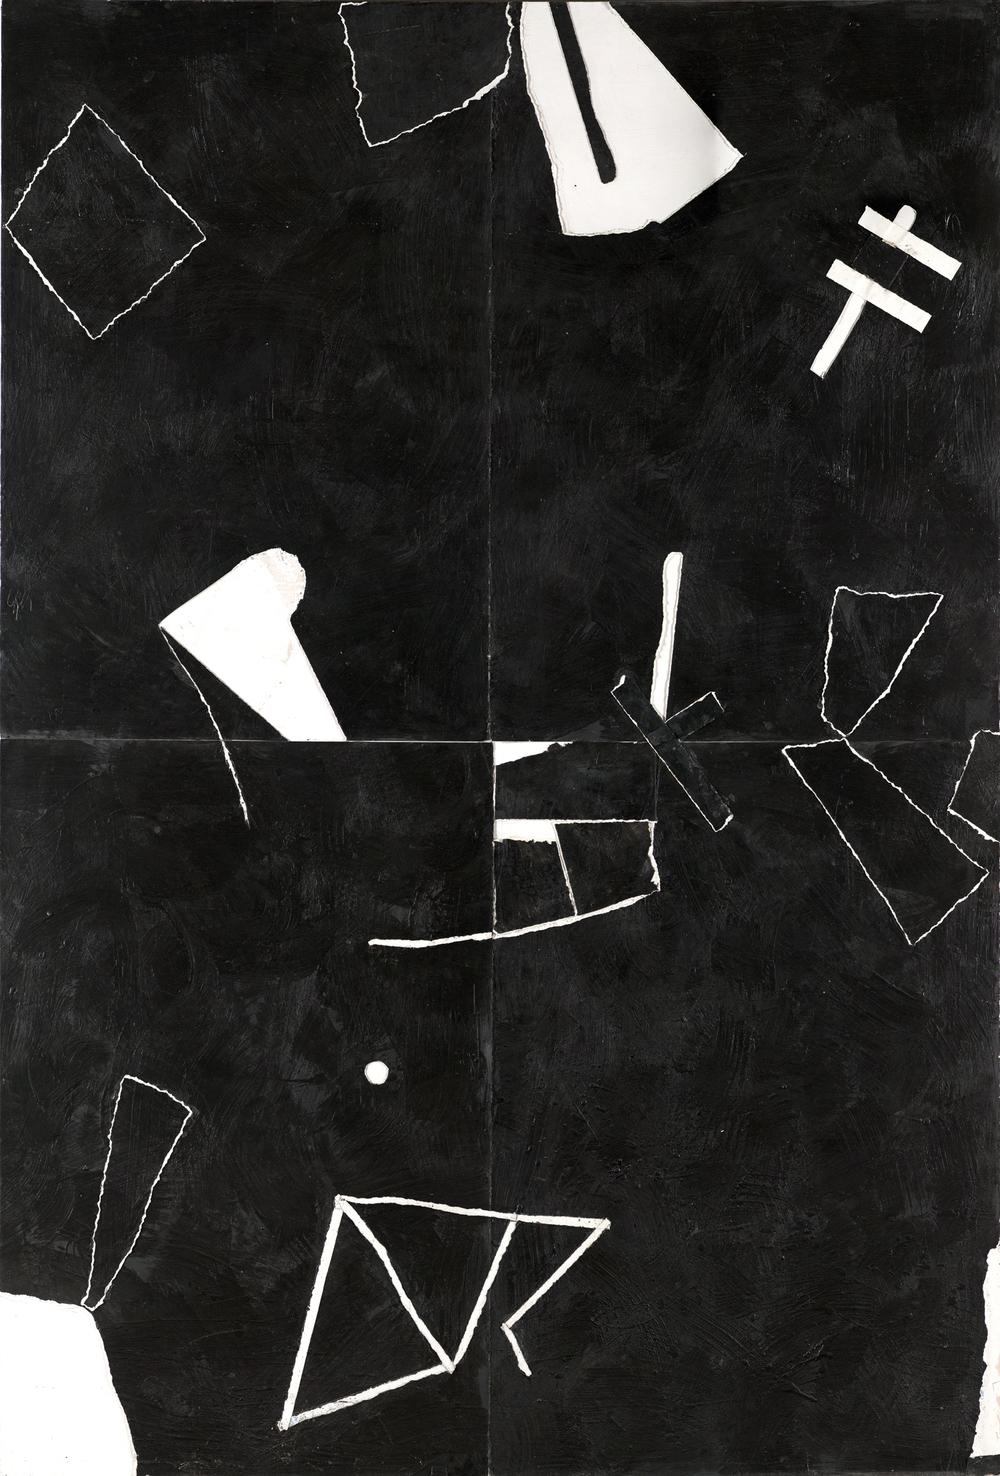 Don Carlos. 2013. 87 x 60.